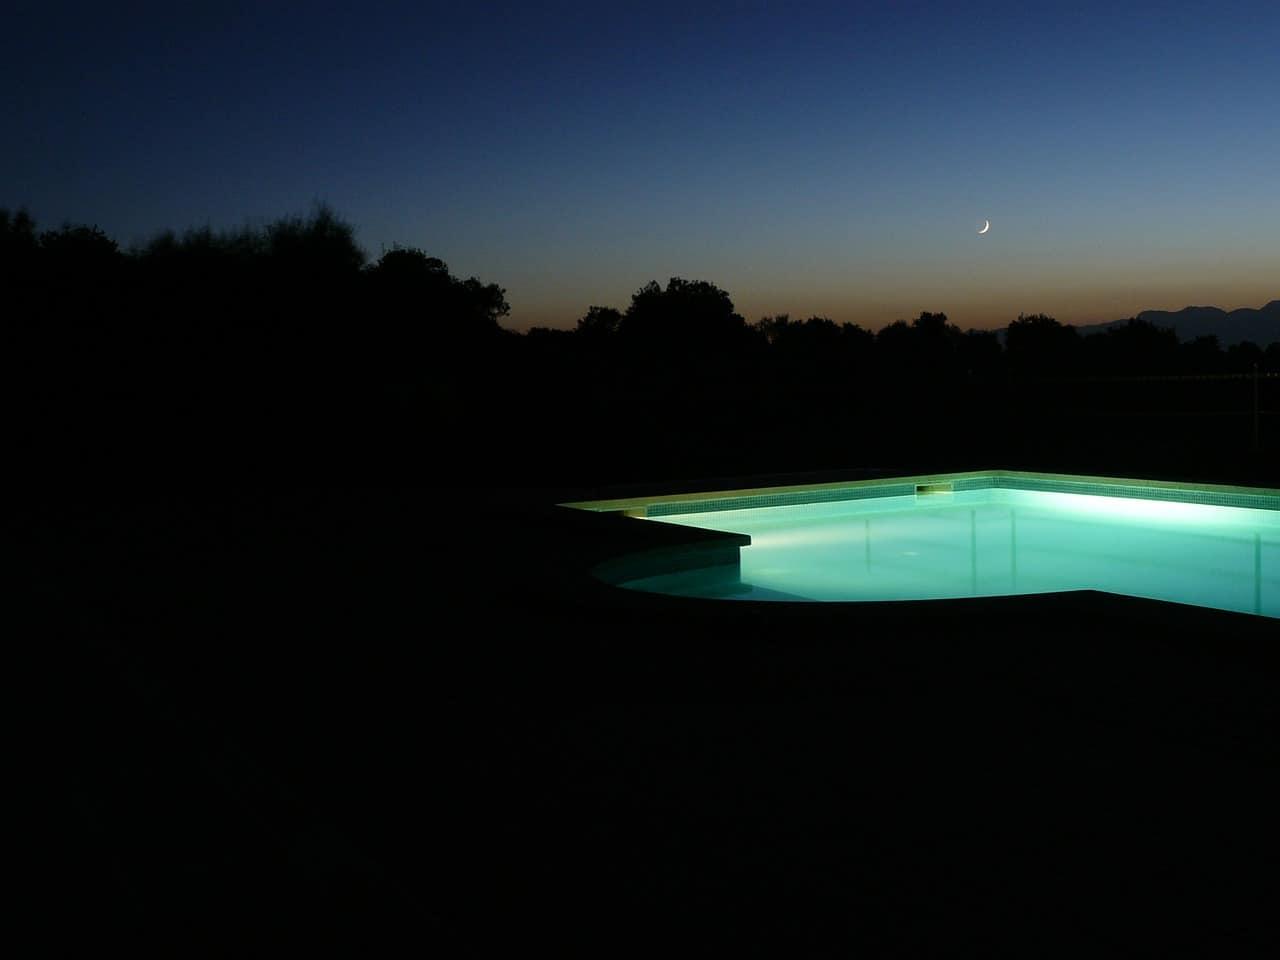 pool-261631_1280